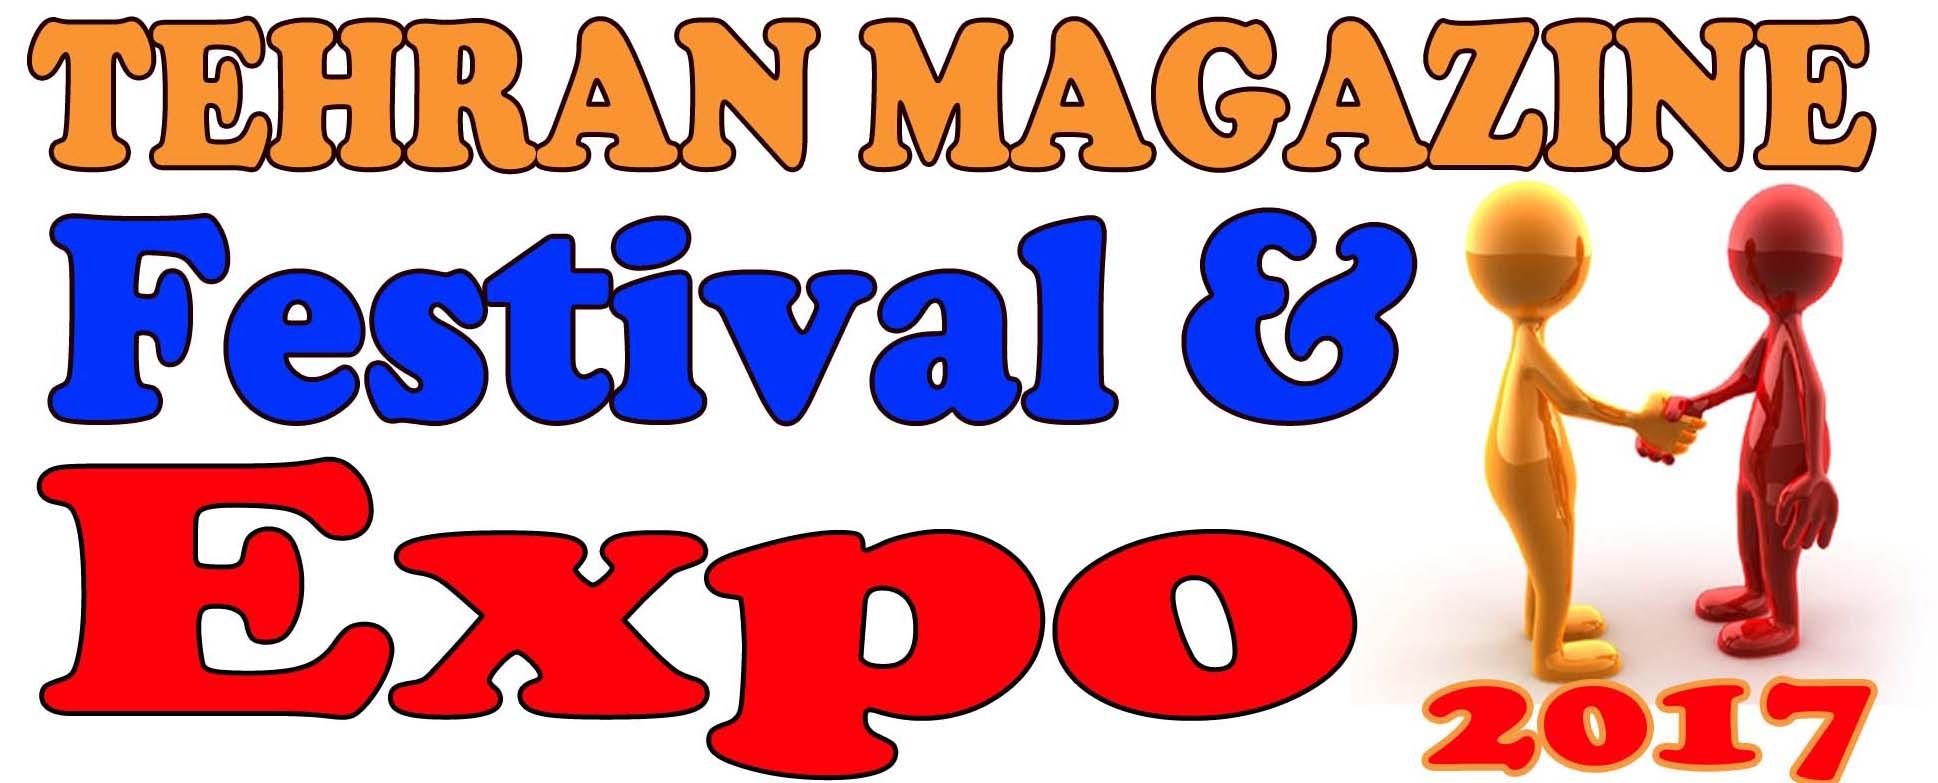 Tehran Magazine Festival And Expo Logo